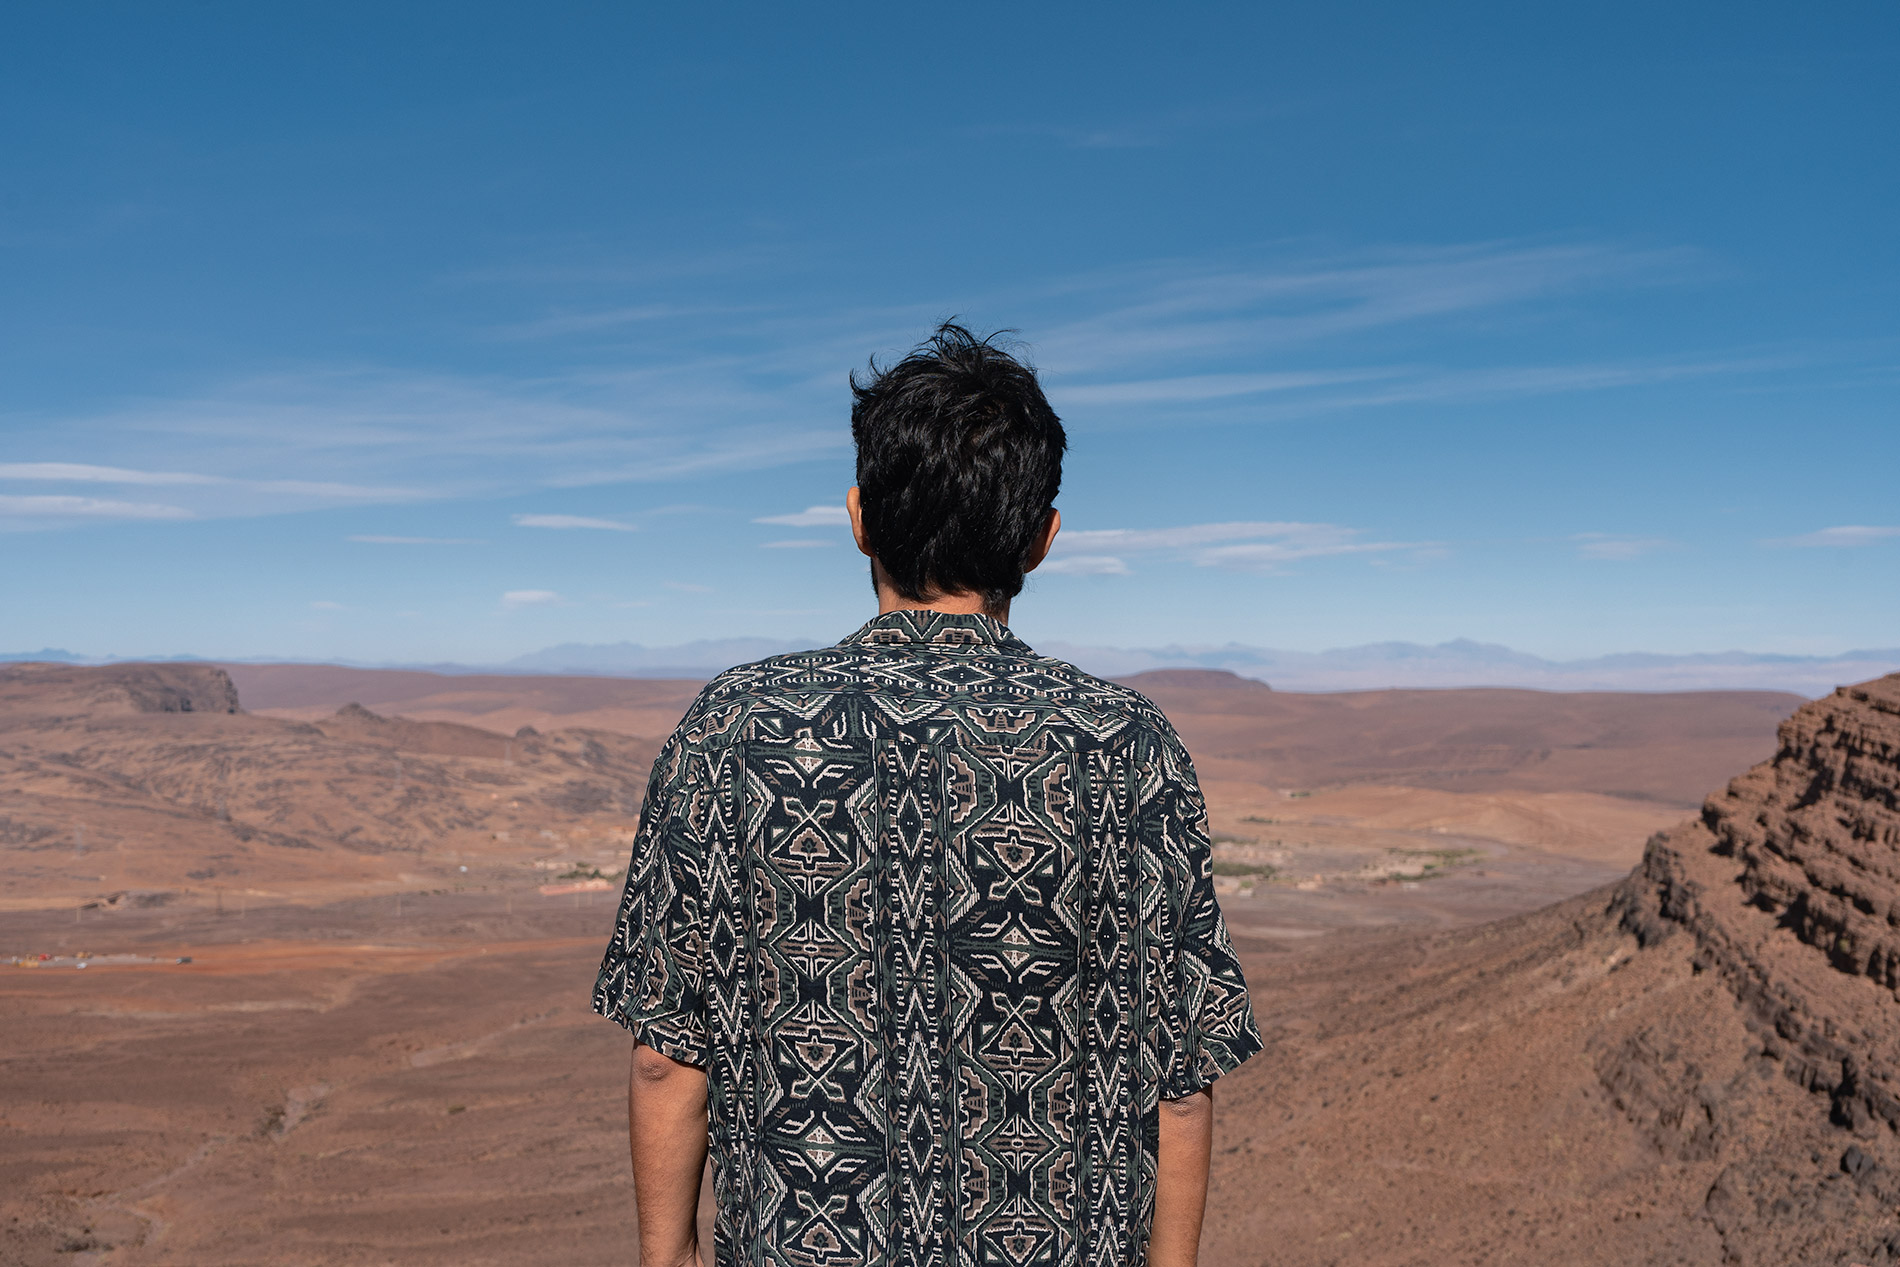 Miradouros maravilhosos em Marrocos